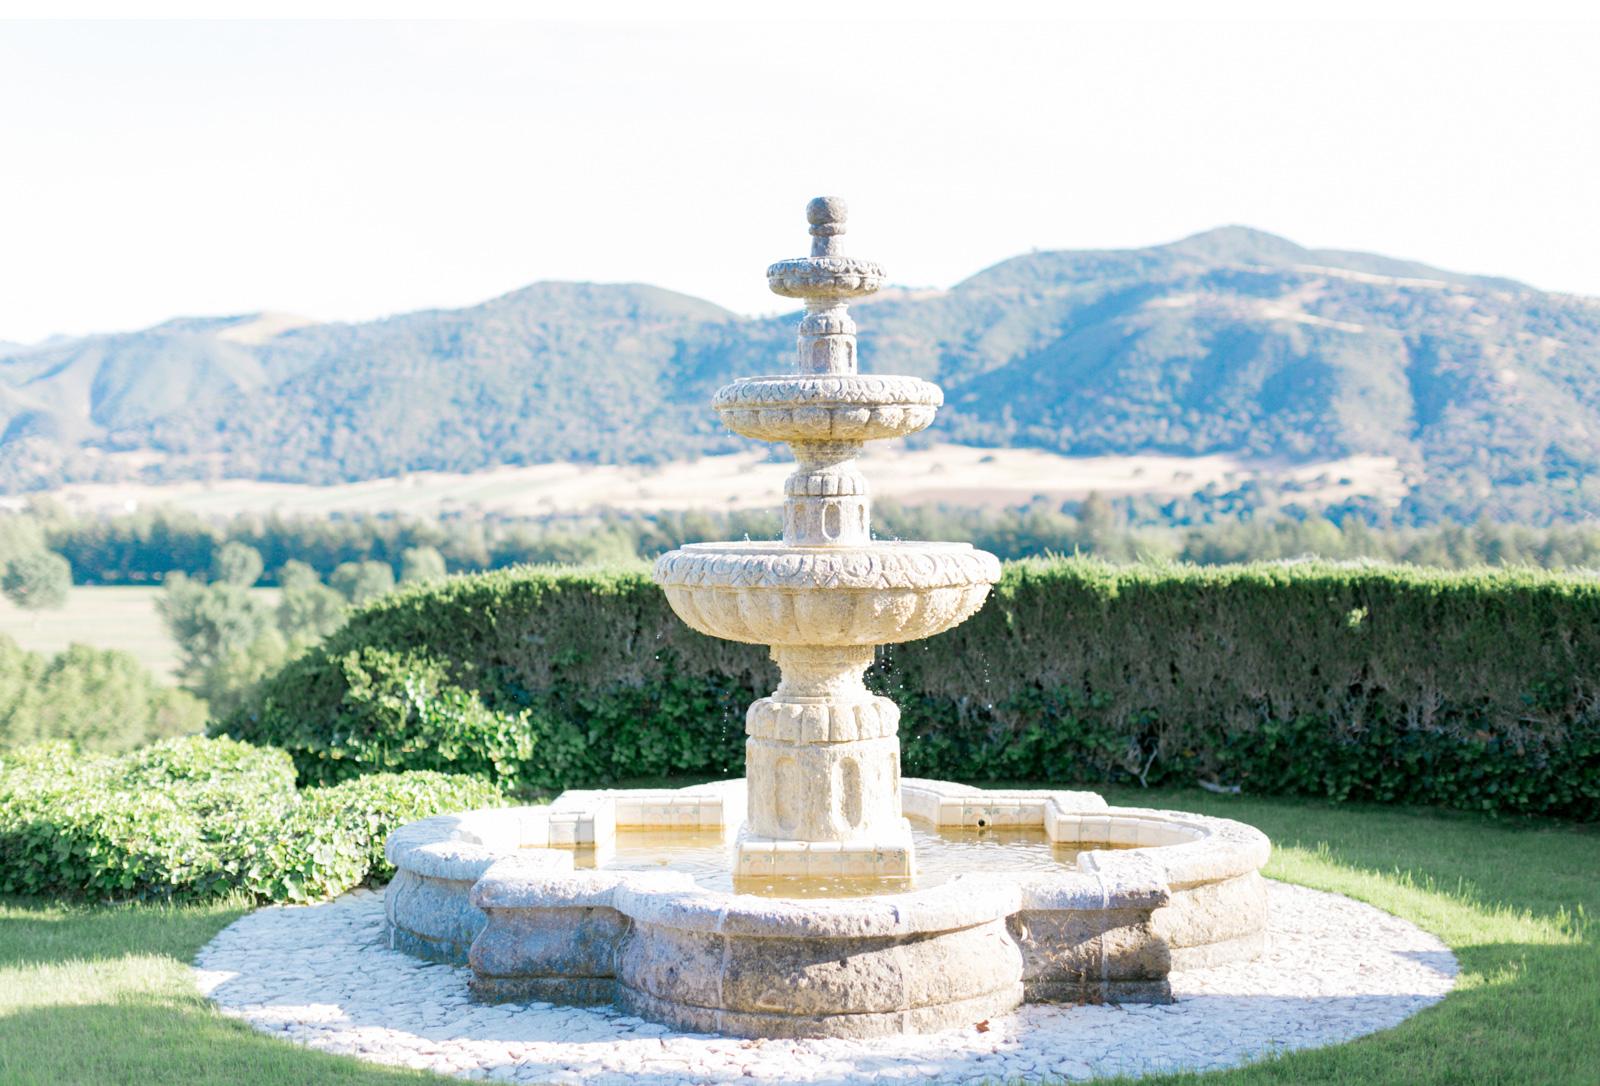 San-Luis-Obispo-Wedding-Photographer-Hammersky-Vineyard-Natalie-Schutt-Photography_05.jpg